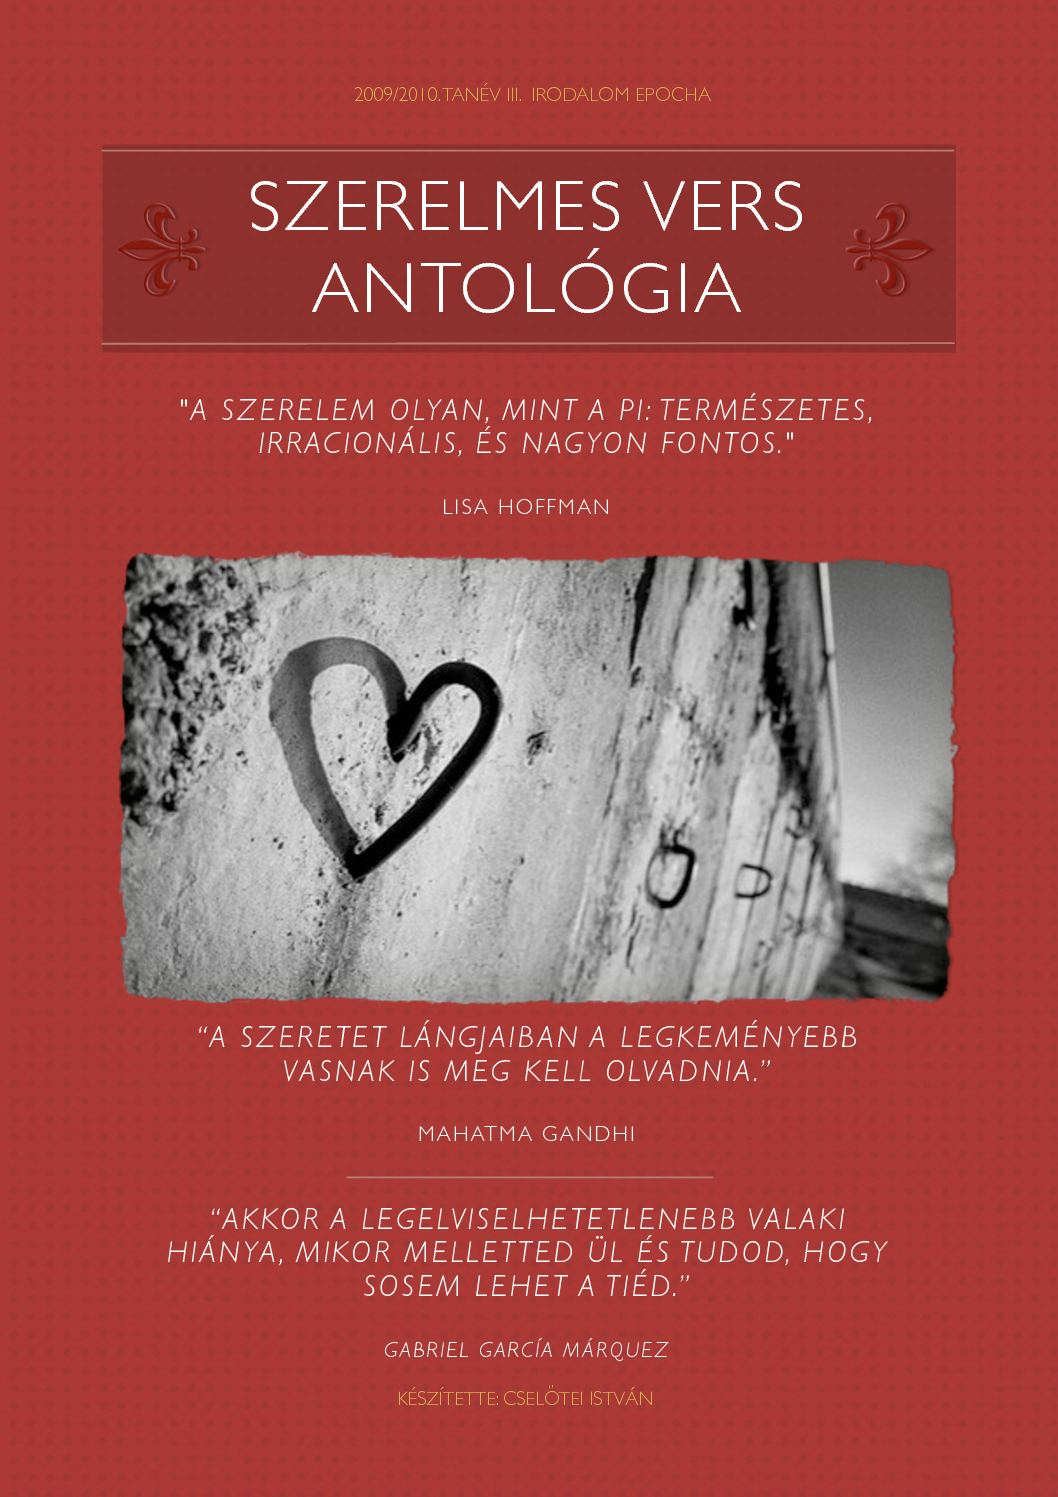 Calaméo - Szerelmes vers antológia